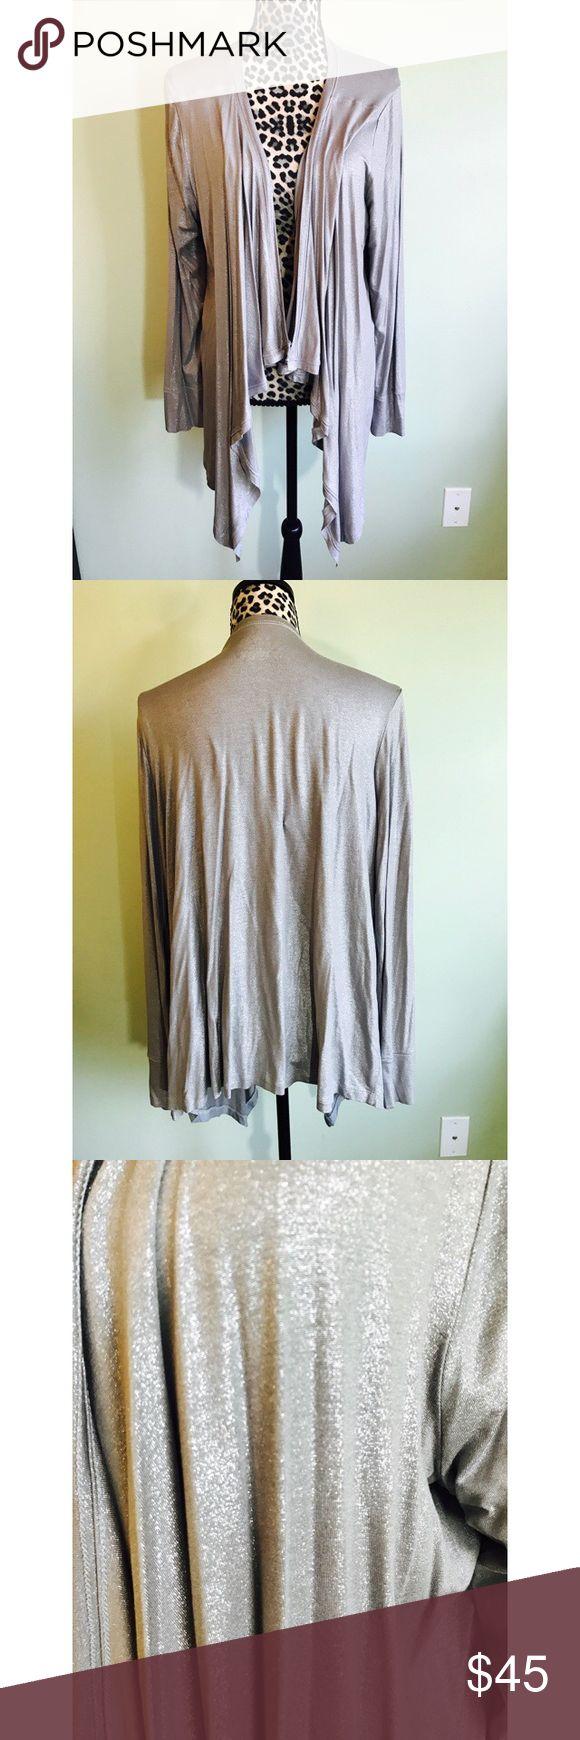 💕Shimmering silver cardigan NWOT NWOT Shimmering silver cardigan. Size 18/20. 95% rayon 5% spandex Lane Bryant Sweaters Cardigans